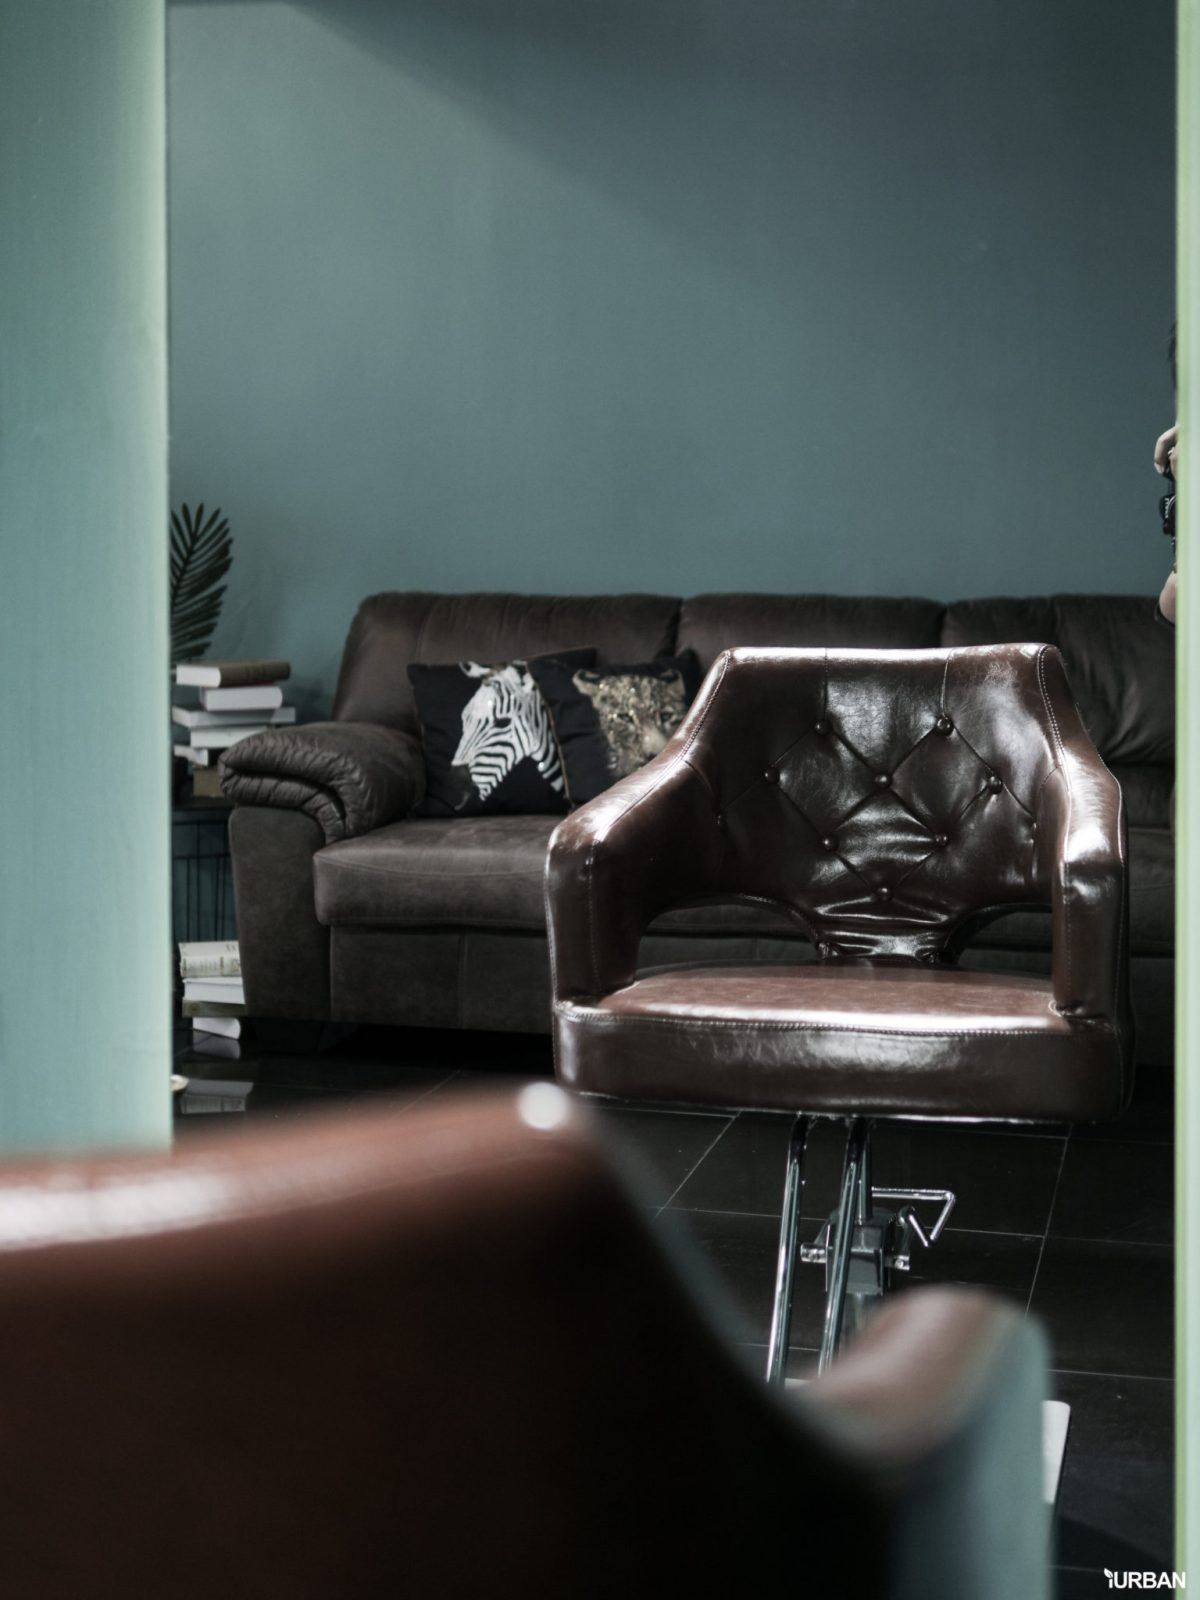 "7 Simply Creative Cafe & Bar ในย่านไลฟ์สไลต์สุดฮิป กับ 24 Hr. Co-Working Space กลาง New Interchange ""รัชดา - ลาดพร้าว"" 71 - cafe"